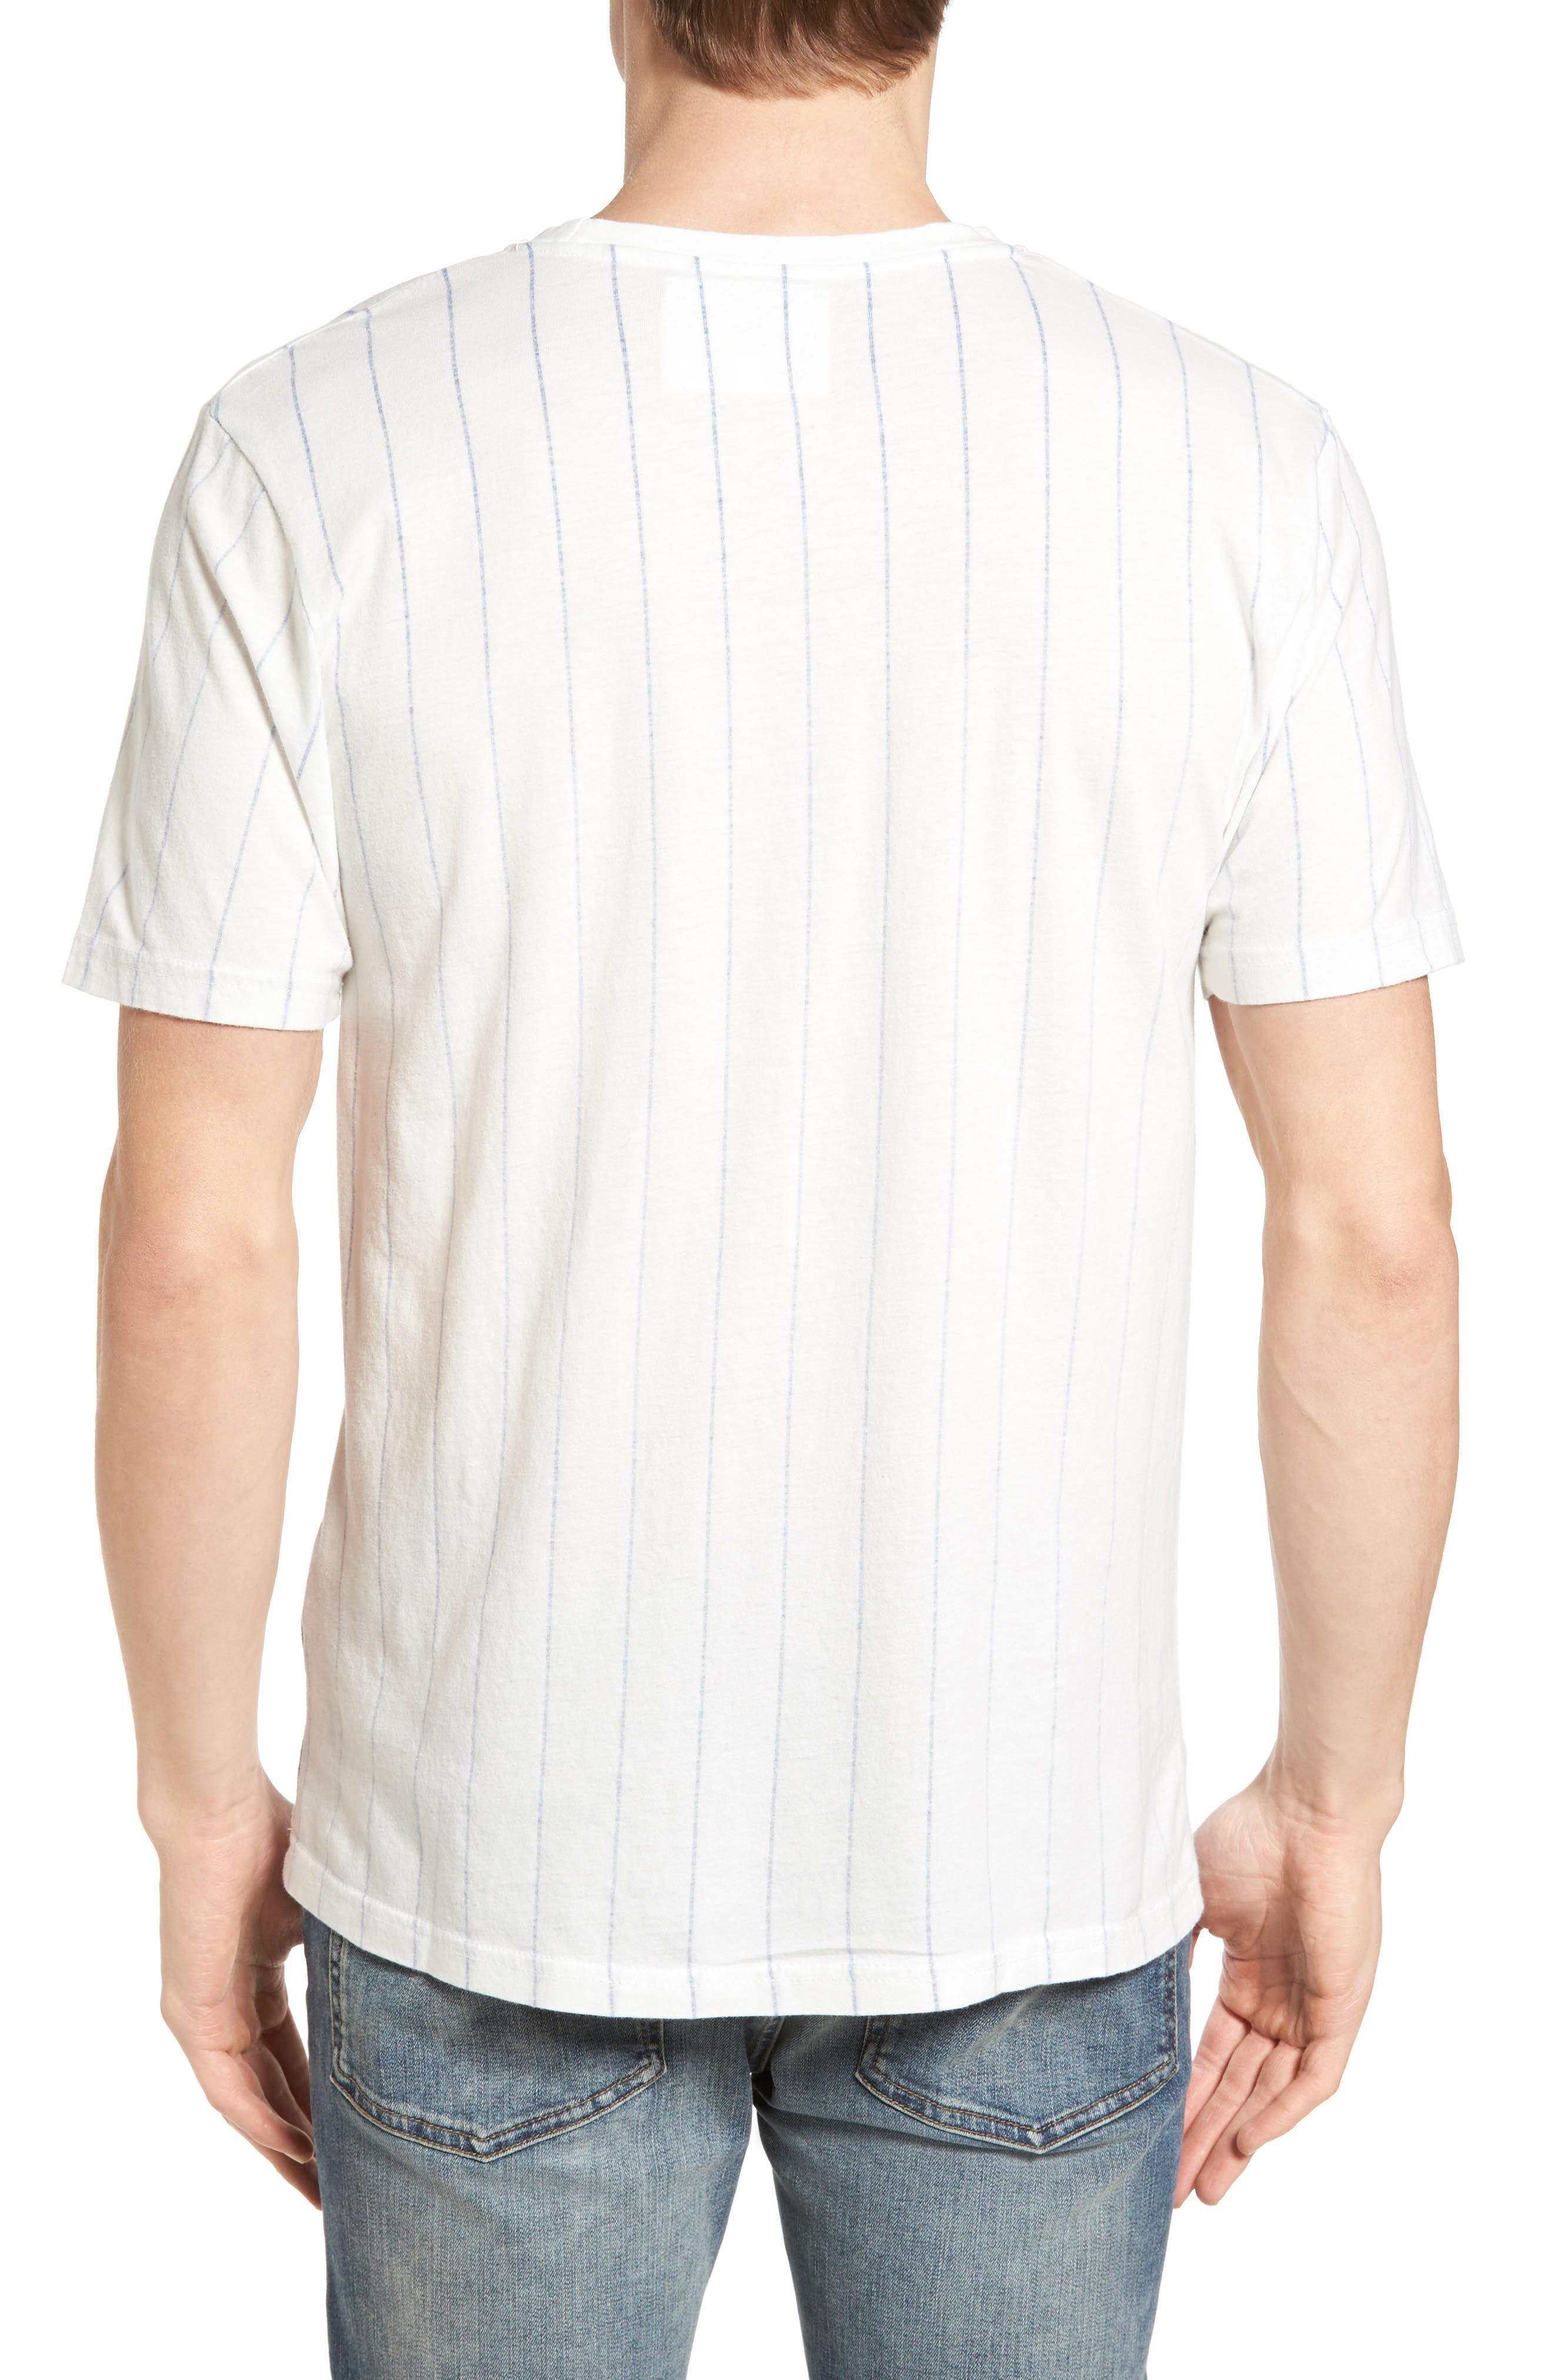 Brass Tack New York Mets T-Shirt,                             Alternate thumbnail 2, color,                             182